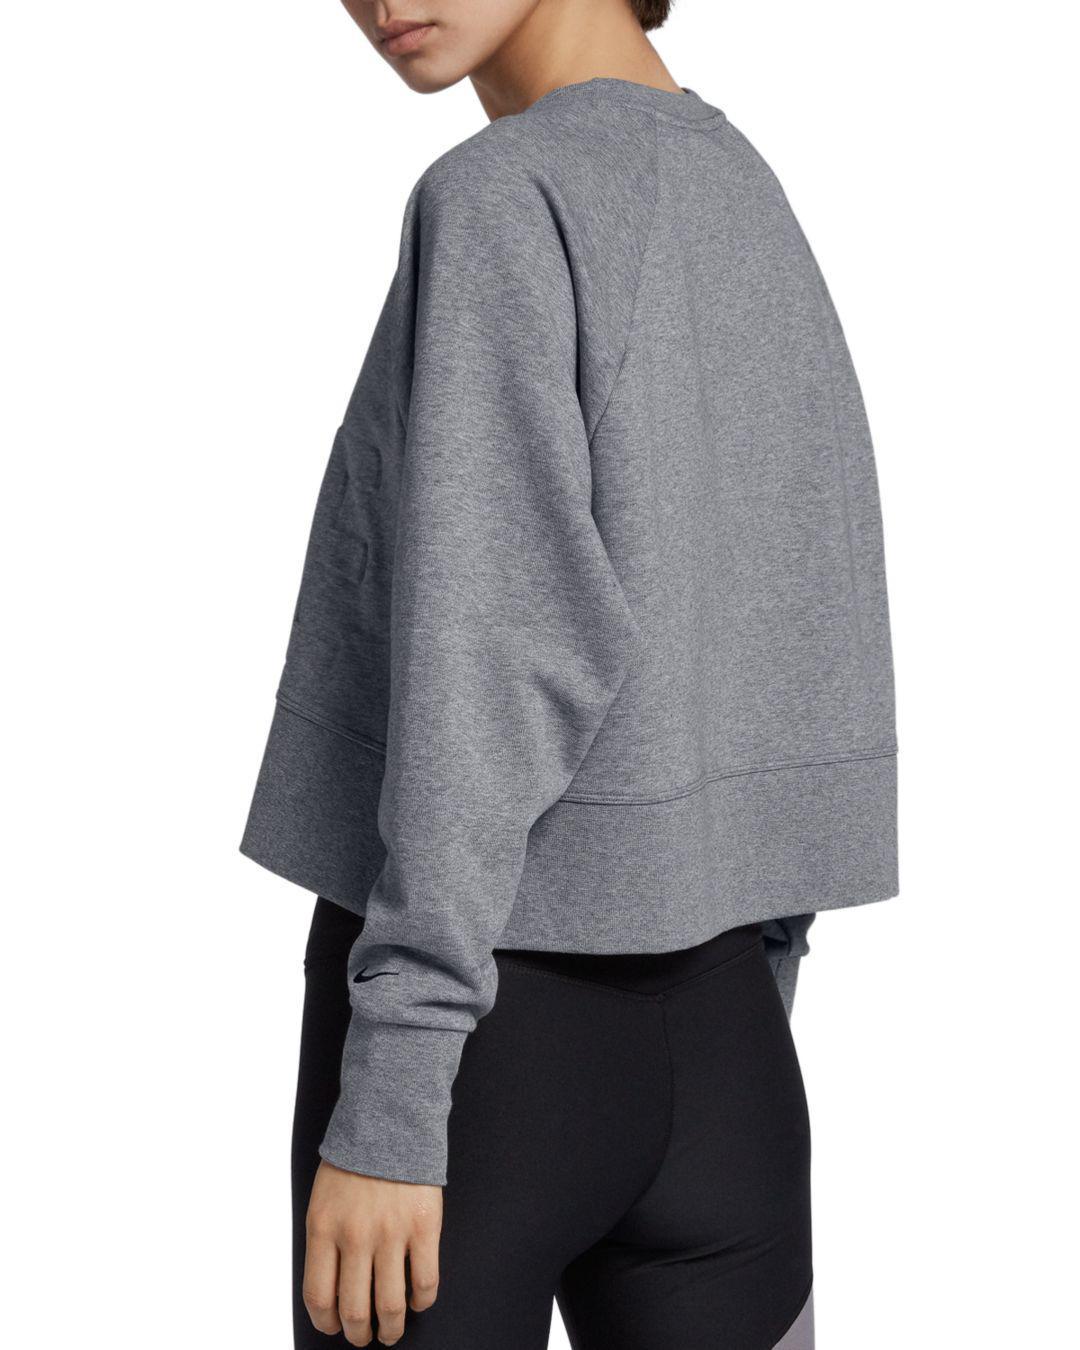 b8b5e2629e320 Lyst - Nike Versa Long-sleeve Training Top in Gray